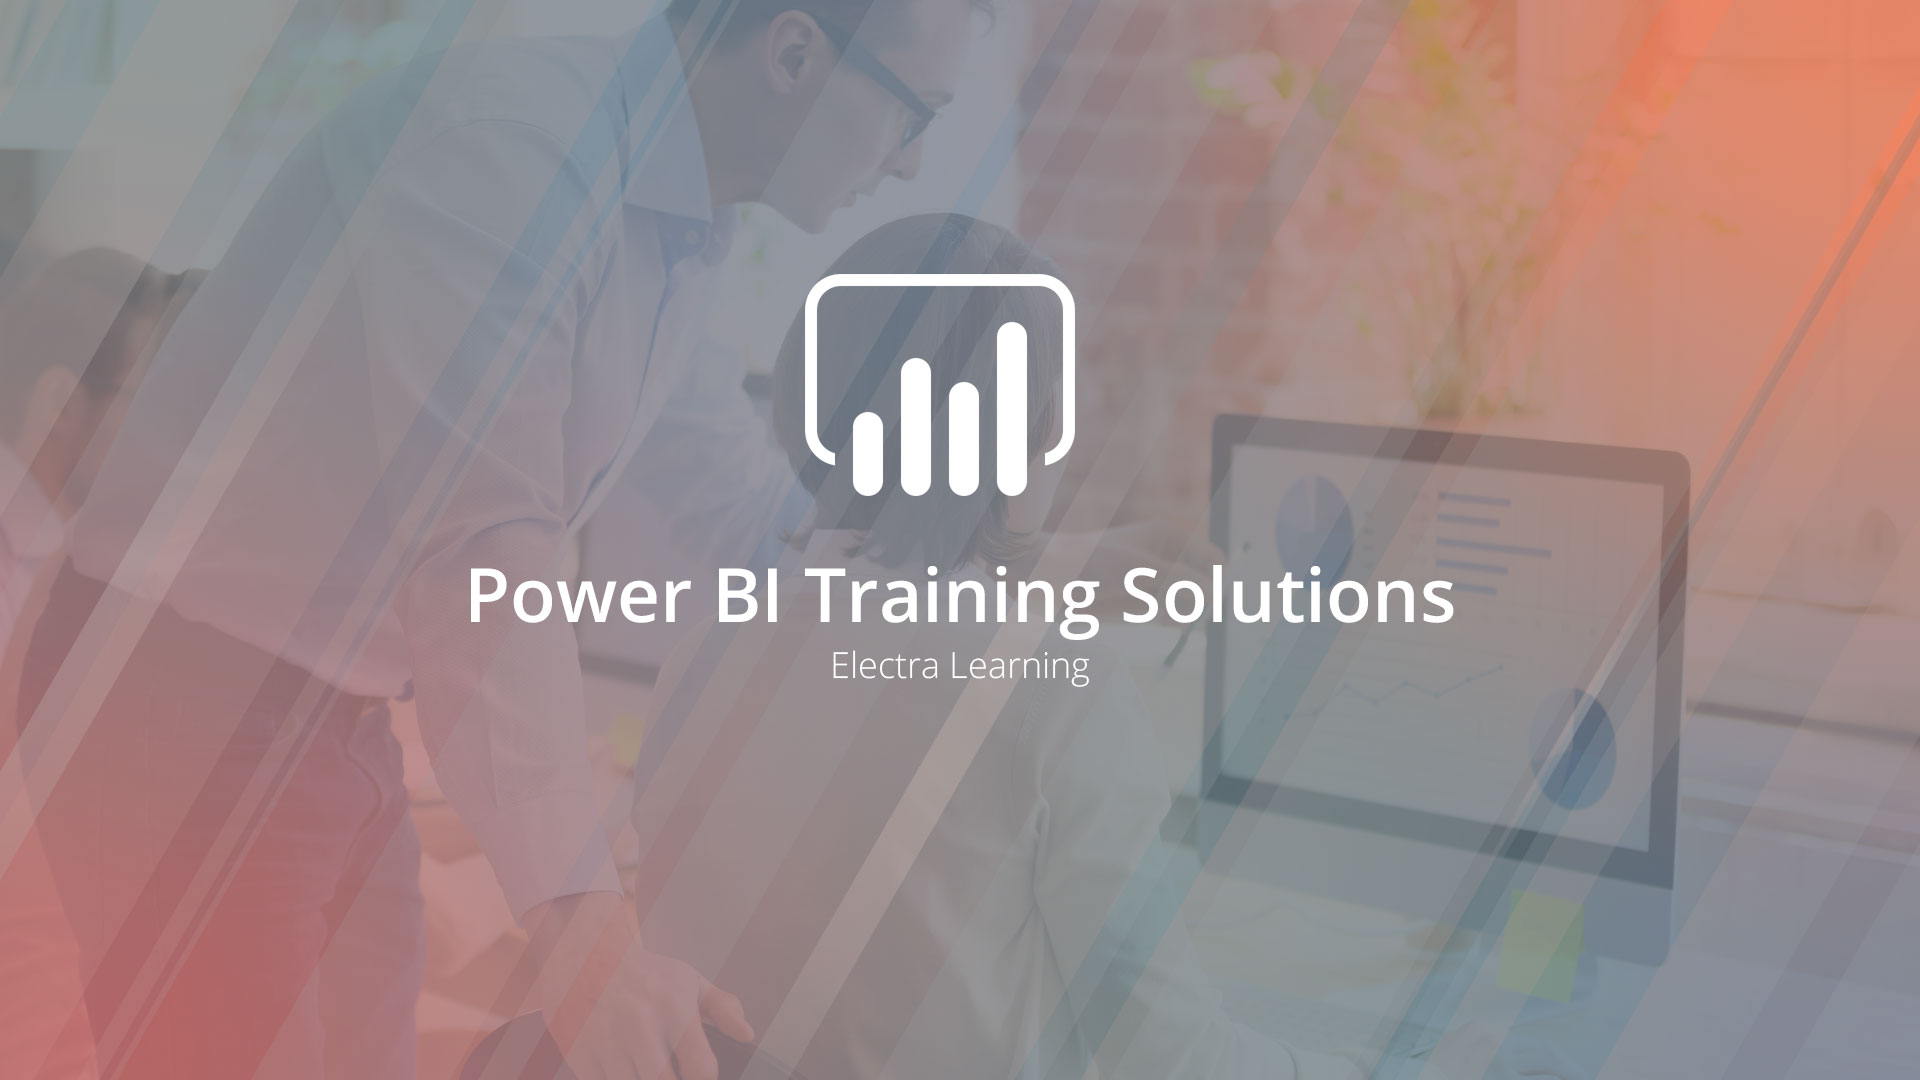 Power BI Training Solutions